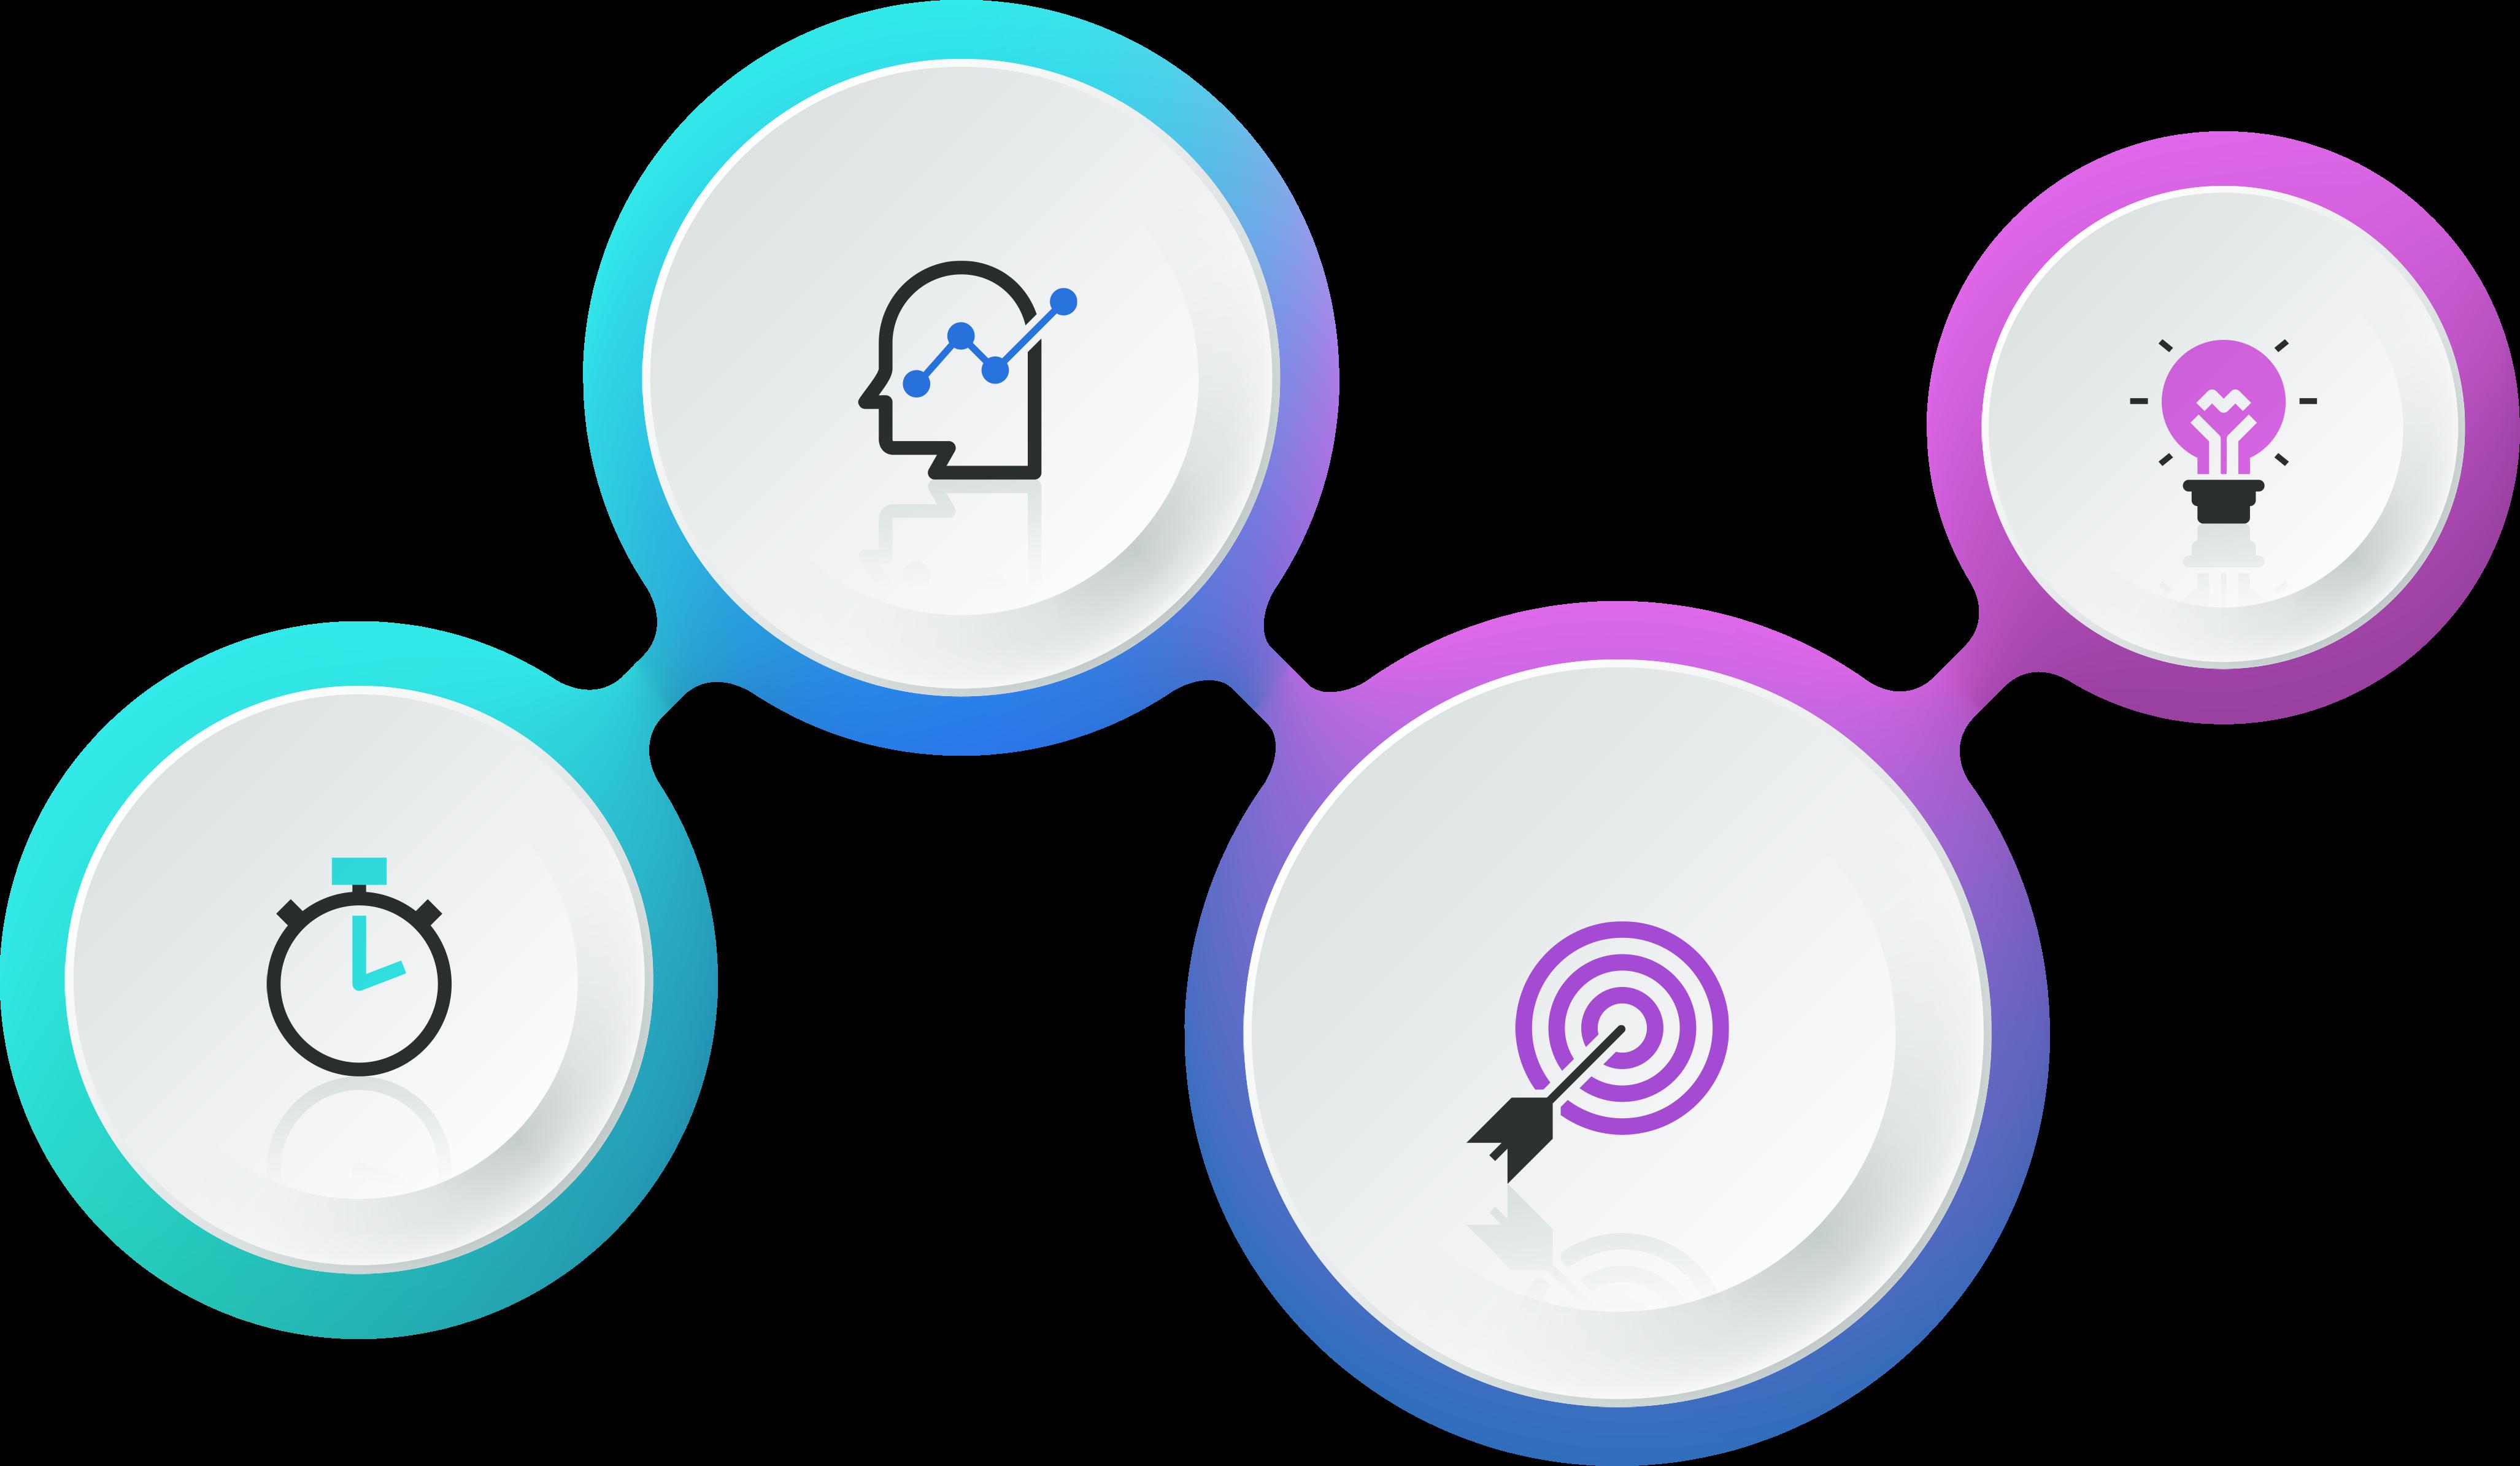 Business Service Portal Image